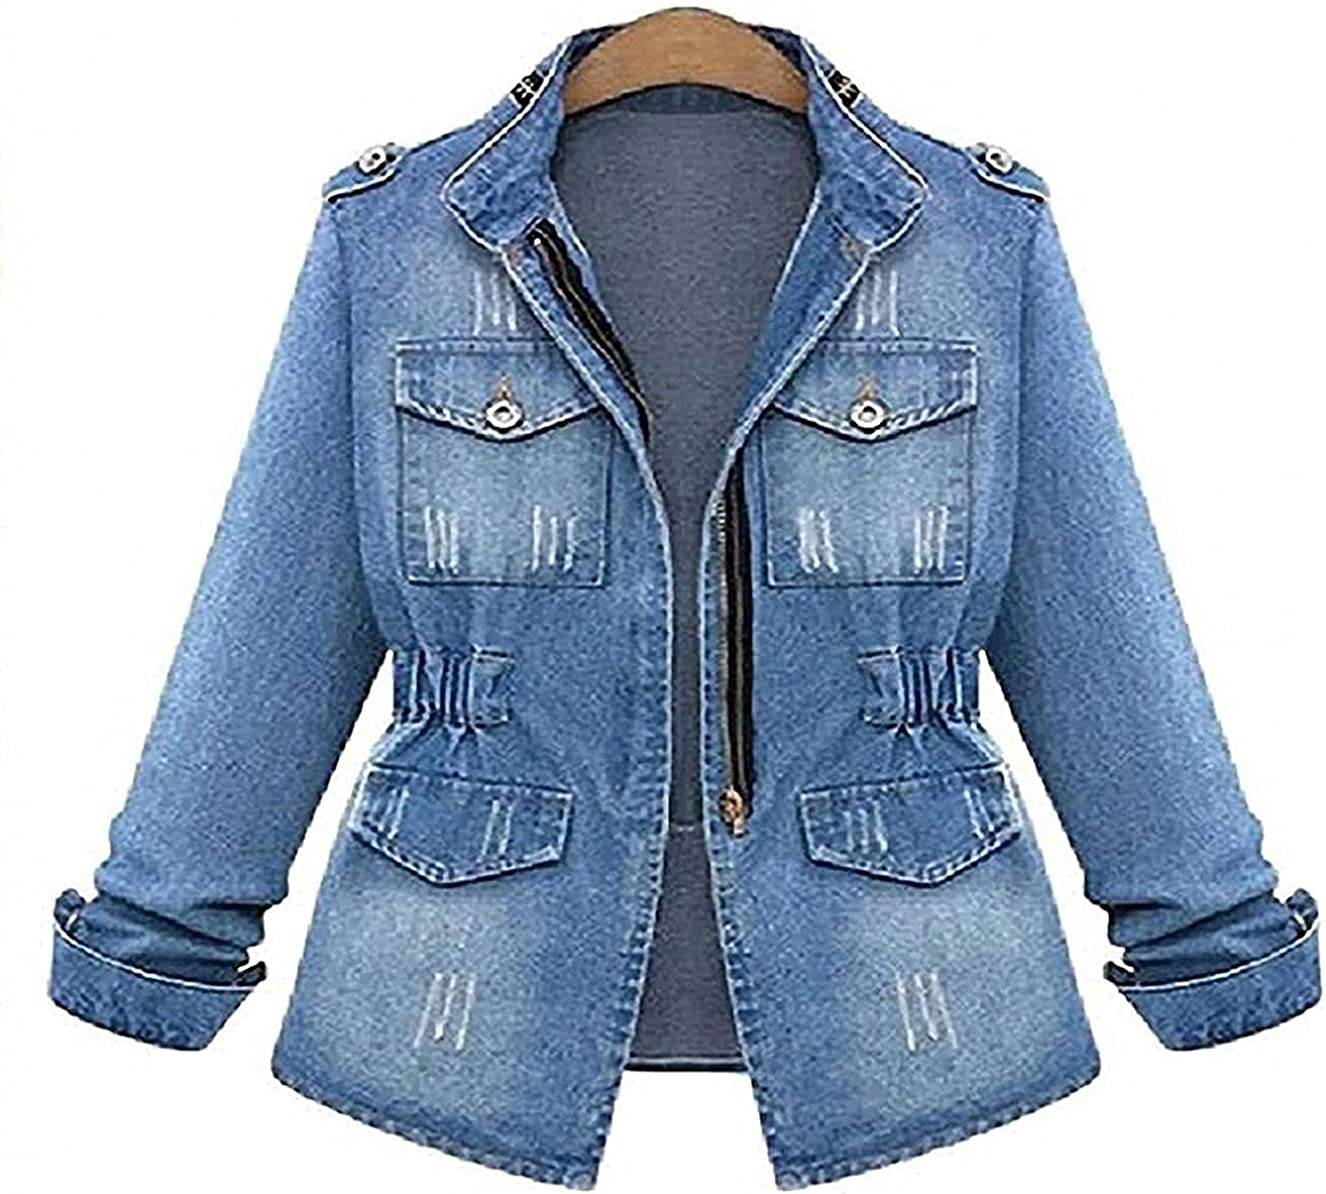 Denim Jackets Women Autumn Long Sleeve Jeans Coat Casual Denim Outwear Tops Plus Size